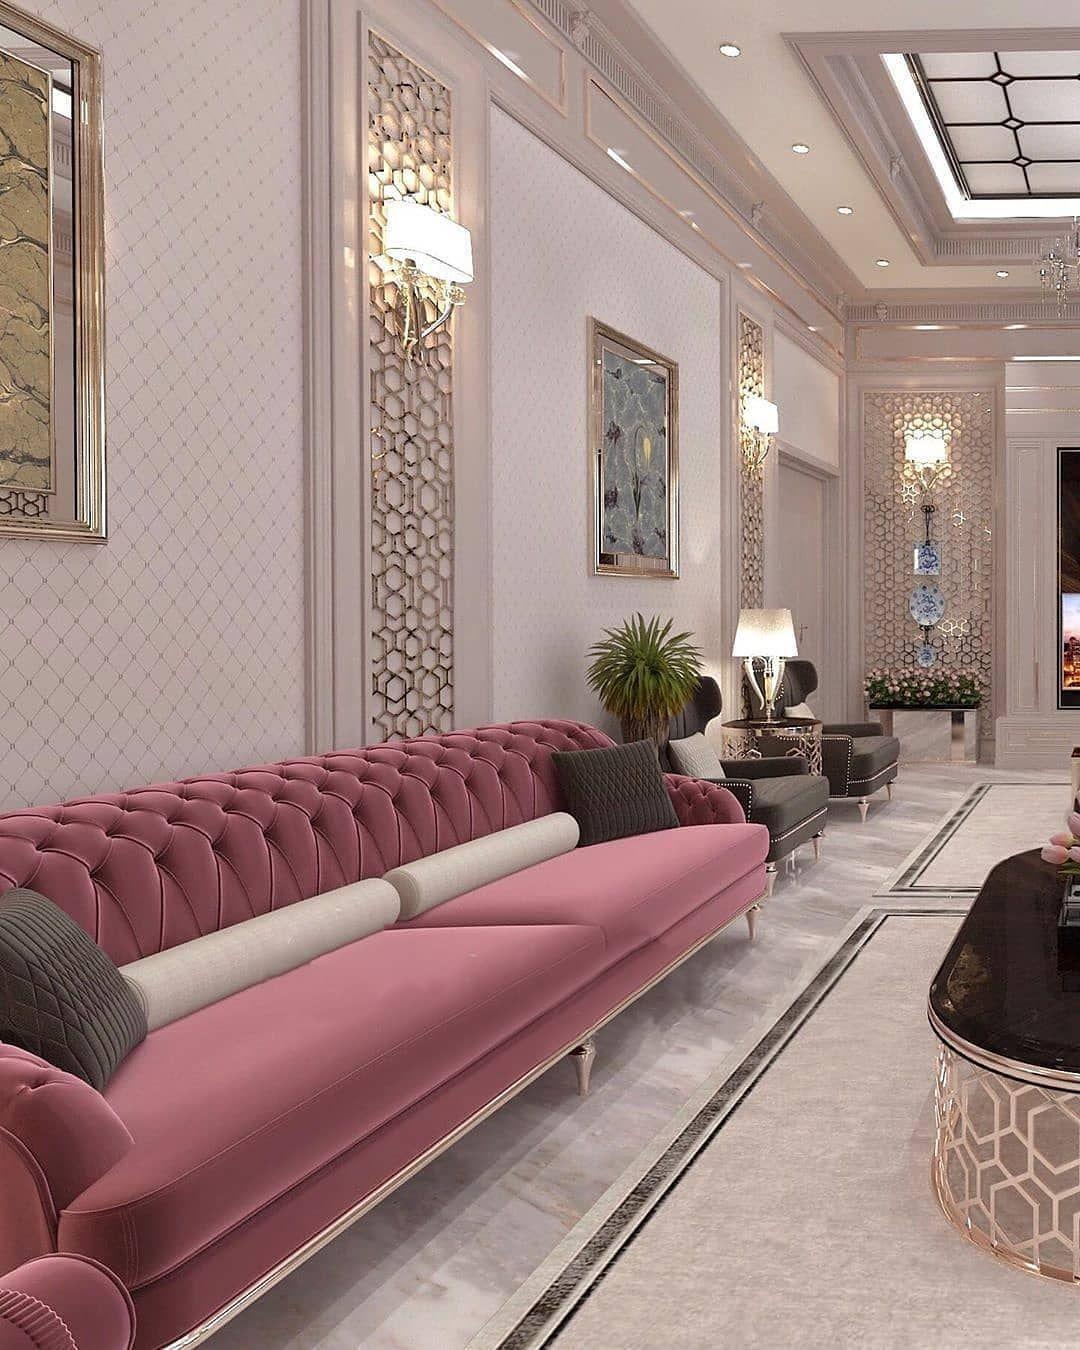 مفروشات الدمام On Instagram كنب جلسات ستاير تفصيل وتنجيد تنفيذ جميع Minimalist Living Room Design Living Room Decor Cozy Furniture Design Living Room